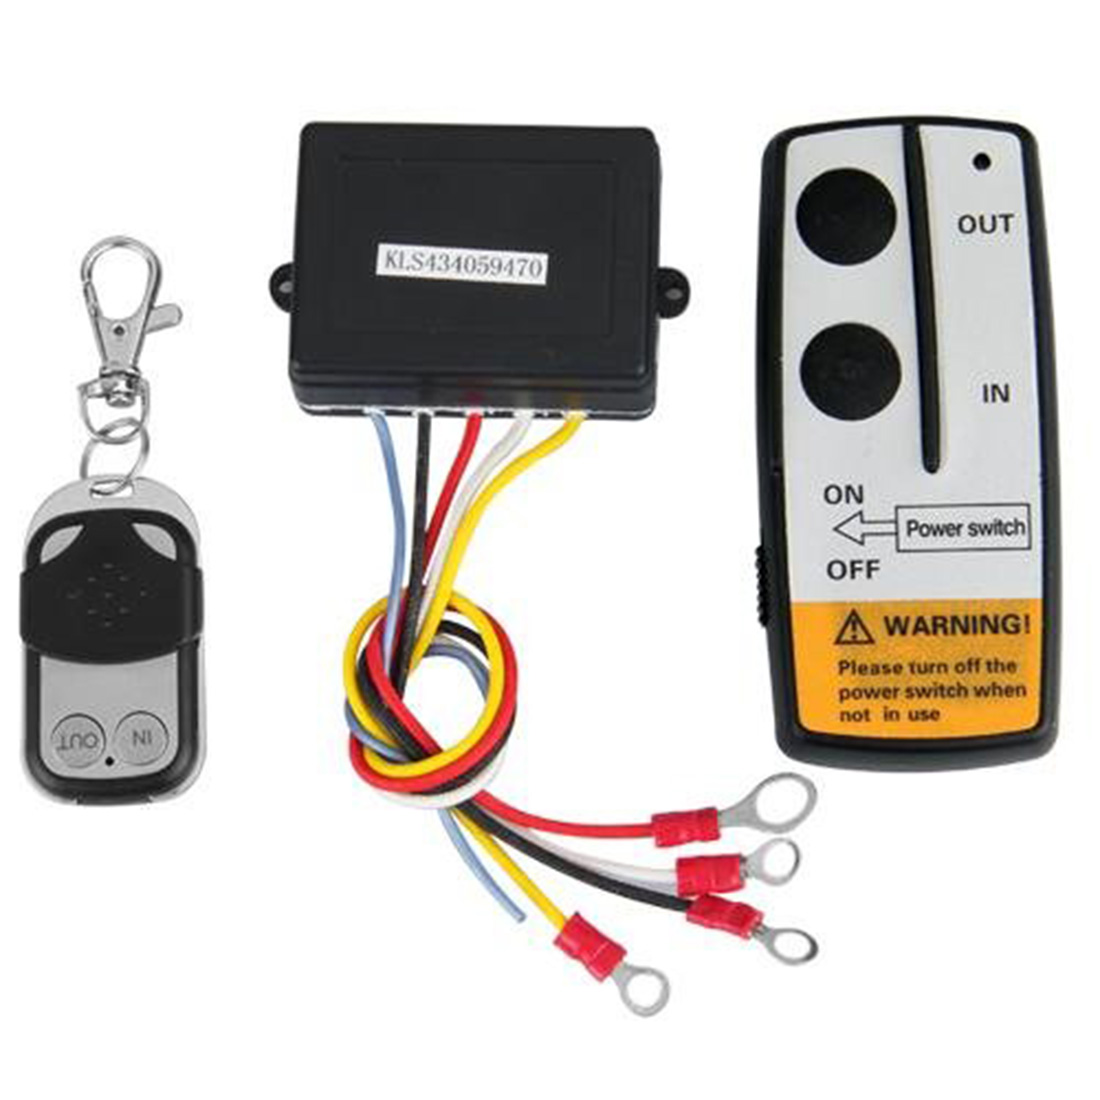 wiring diagram for 110 atv 110 atv frame wiring diagram